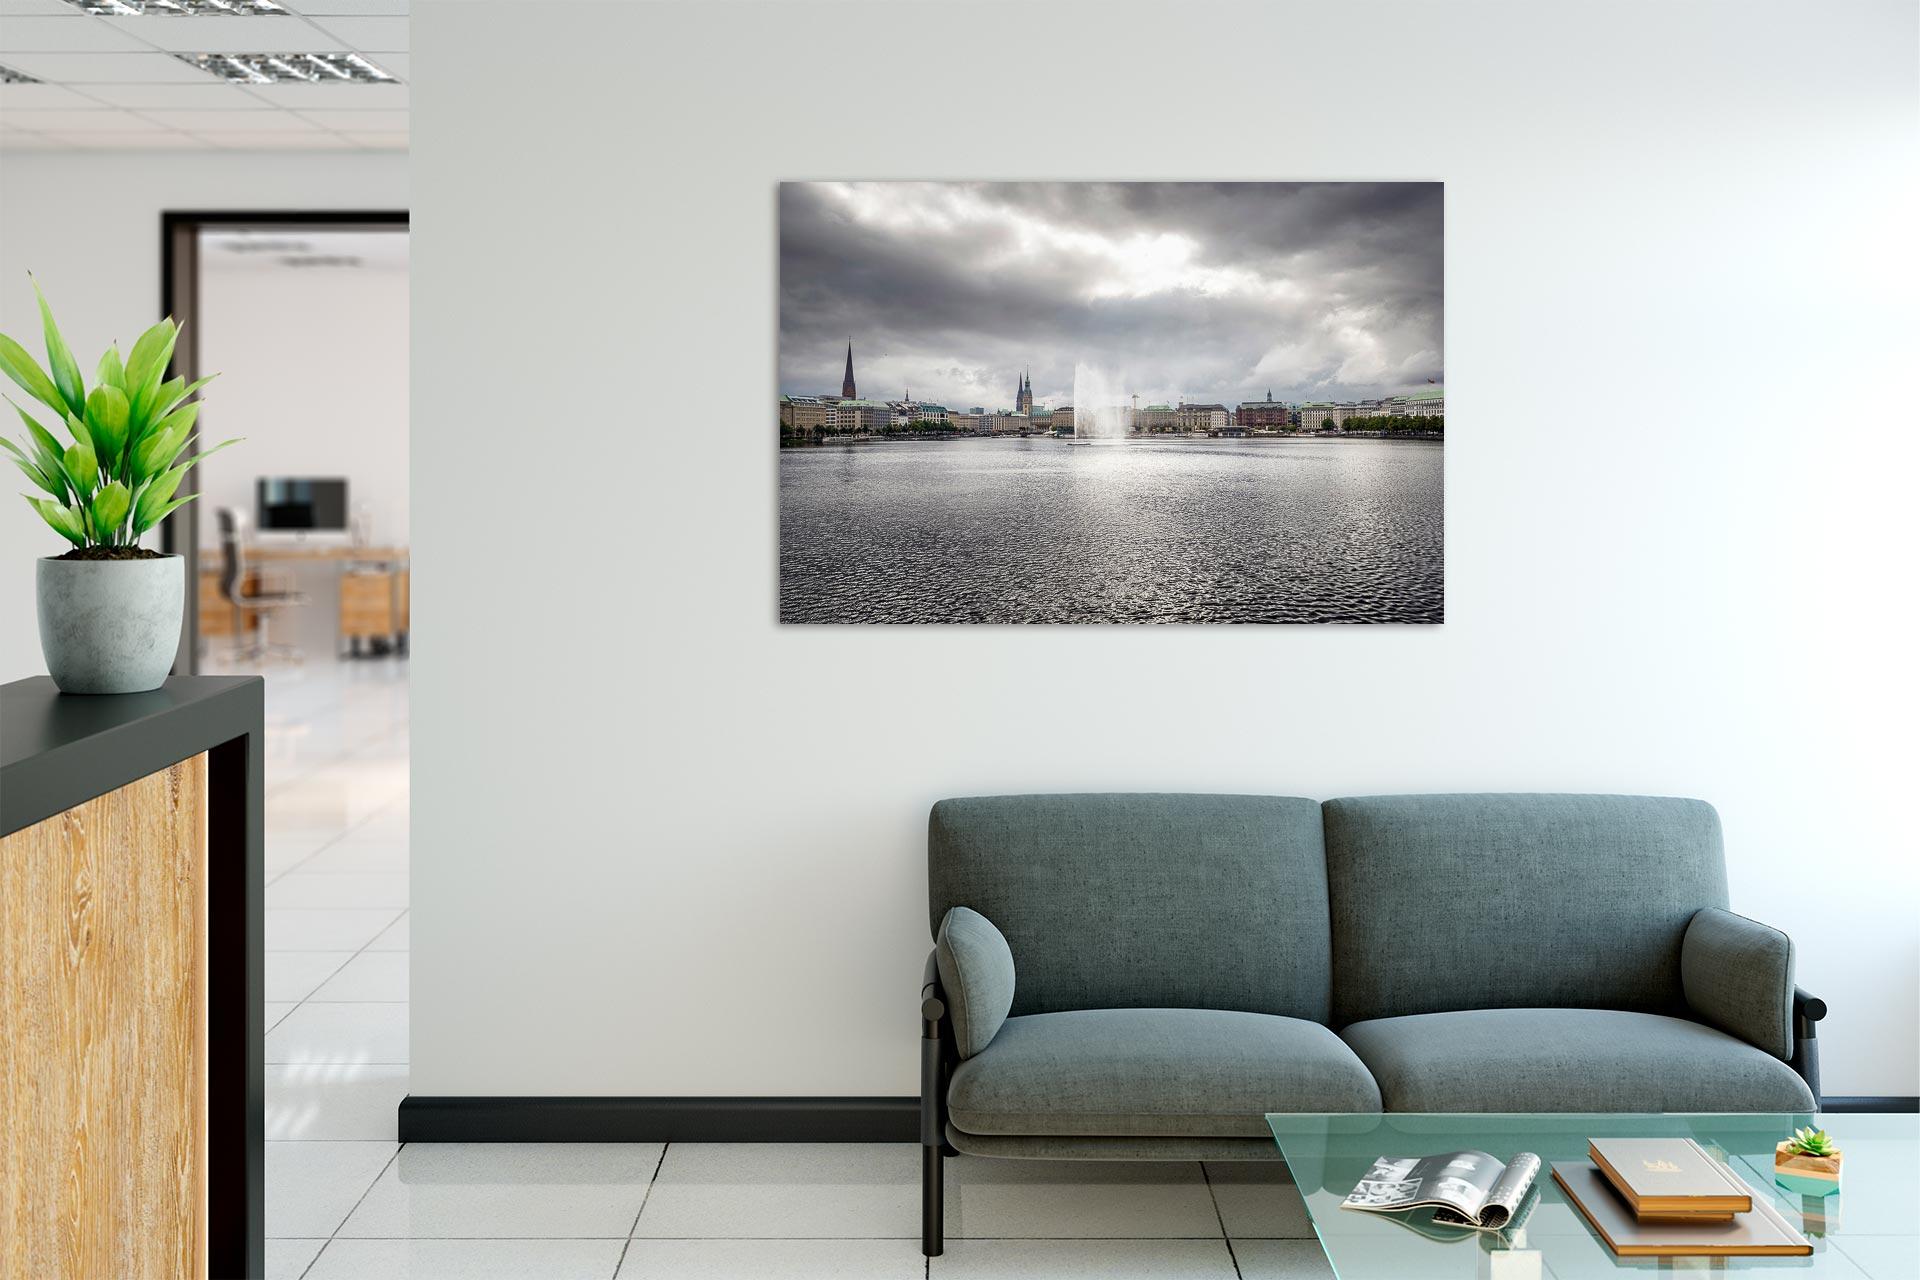 TG616-silbrige-alster-wandbild-bild-auf-leinwand-acrylglas-aludibond-empfang